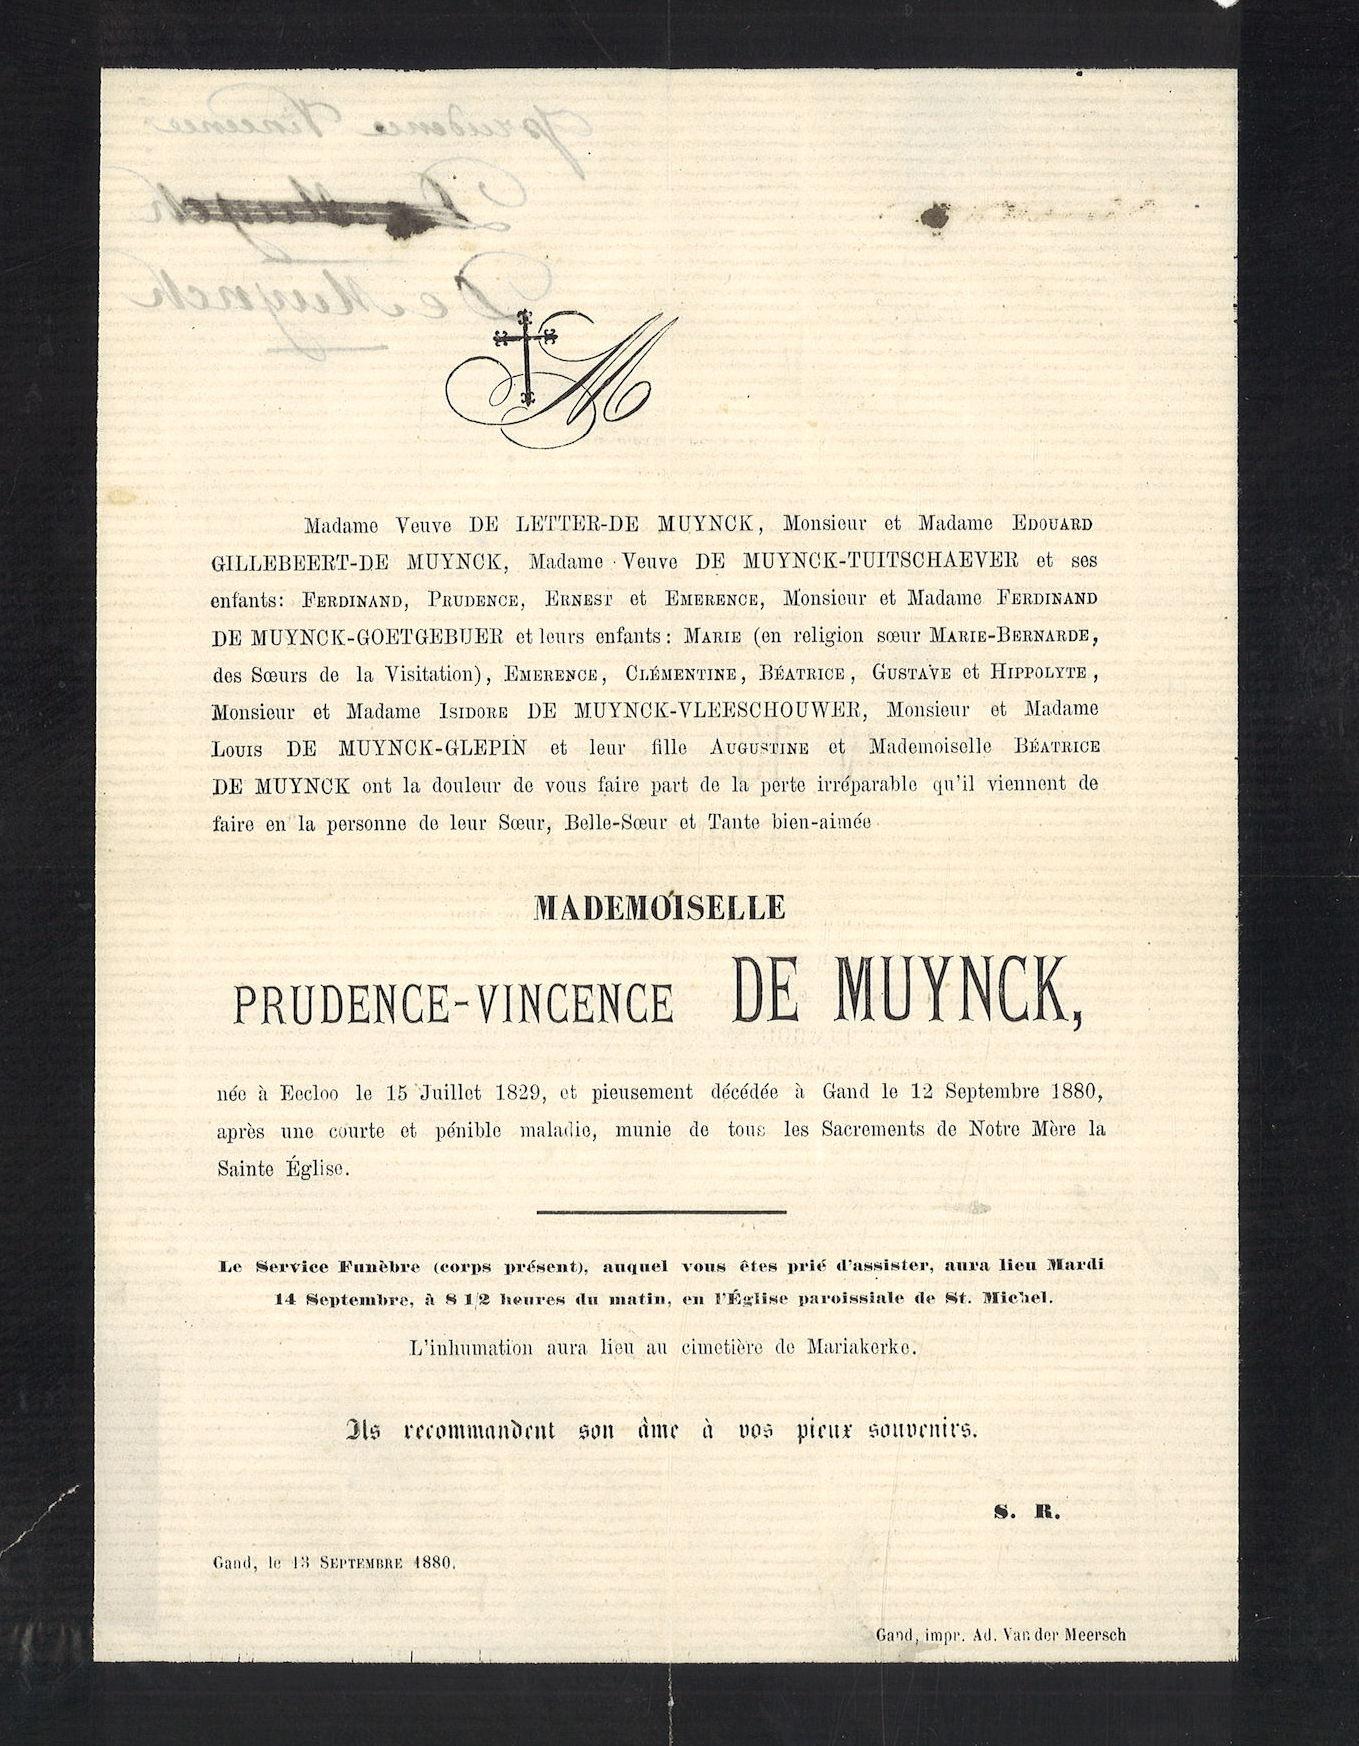 Prudence-Vincence De Muynck